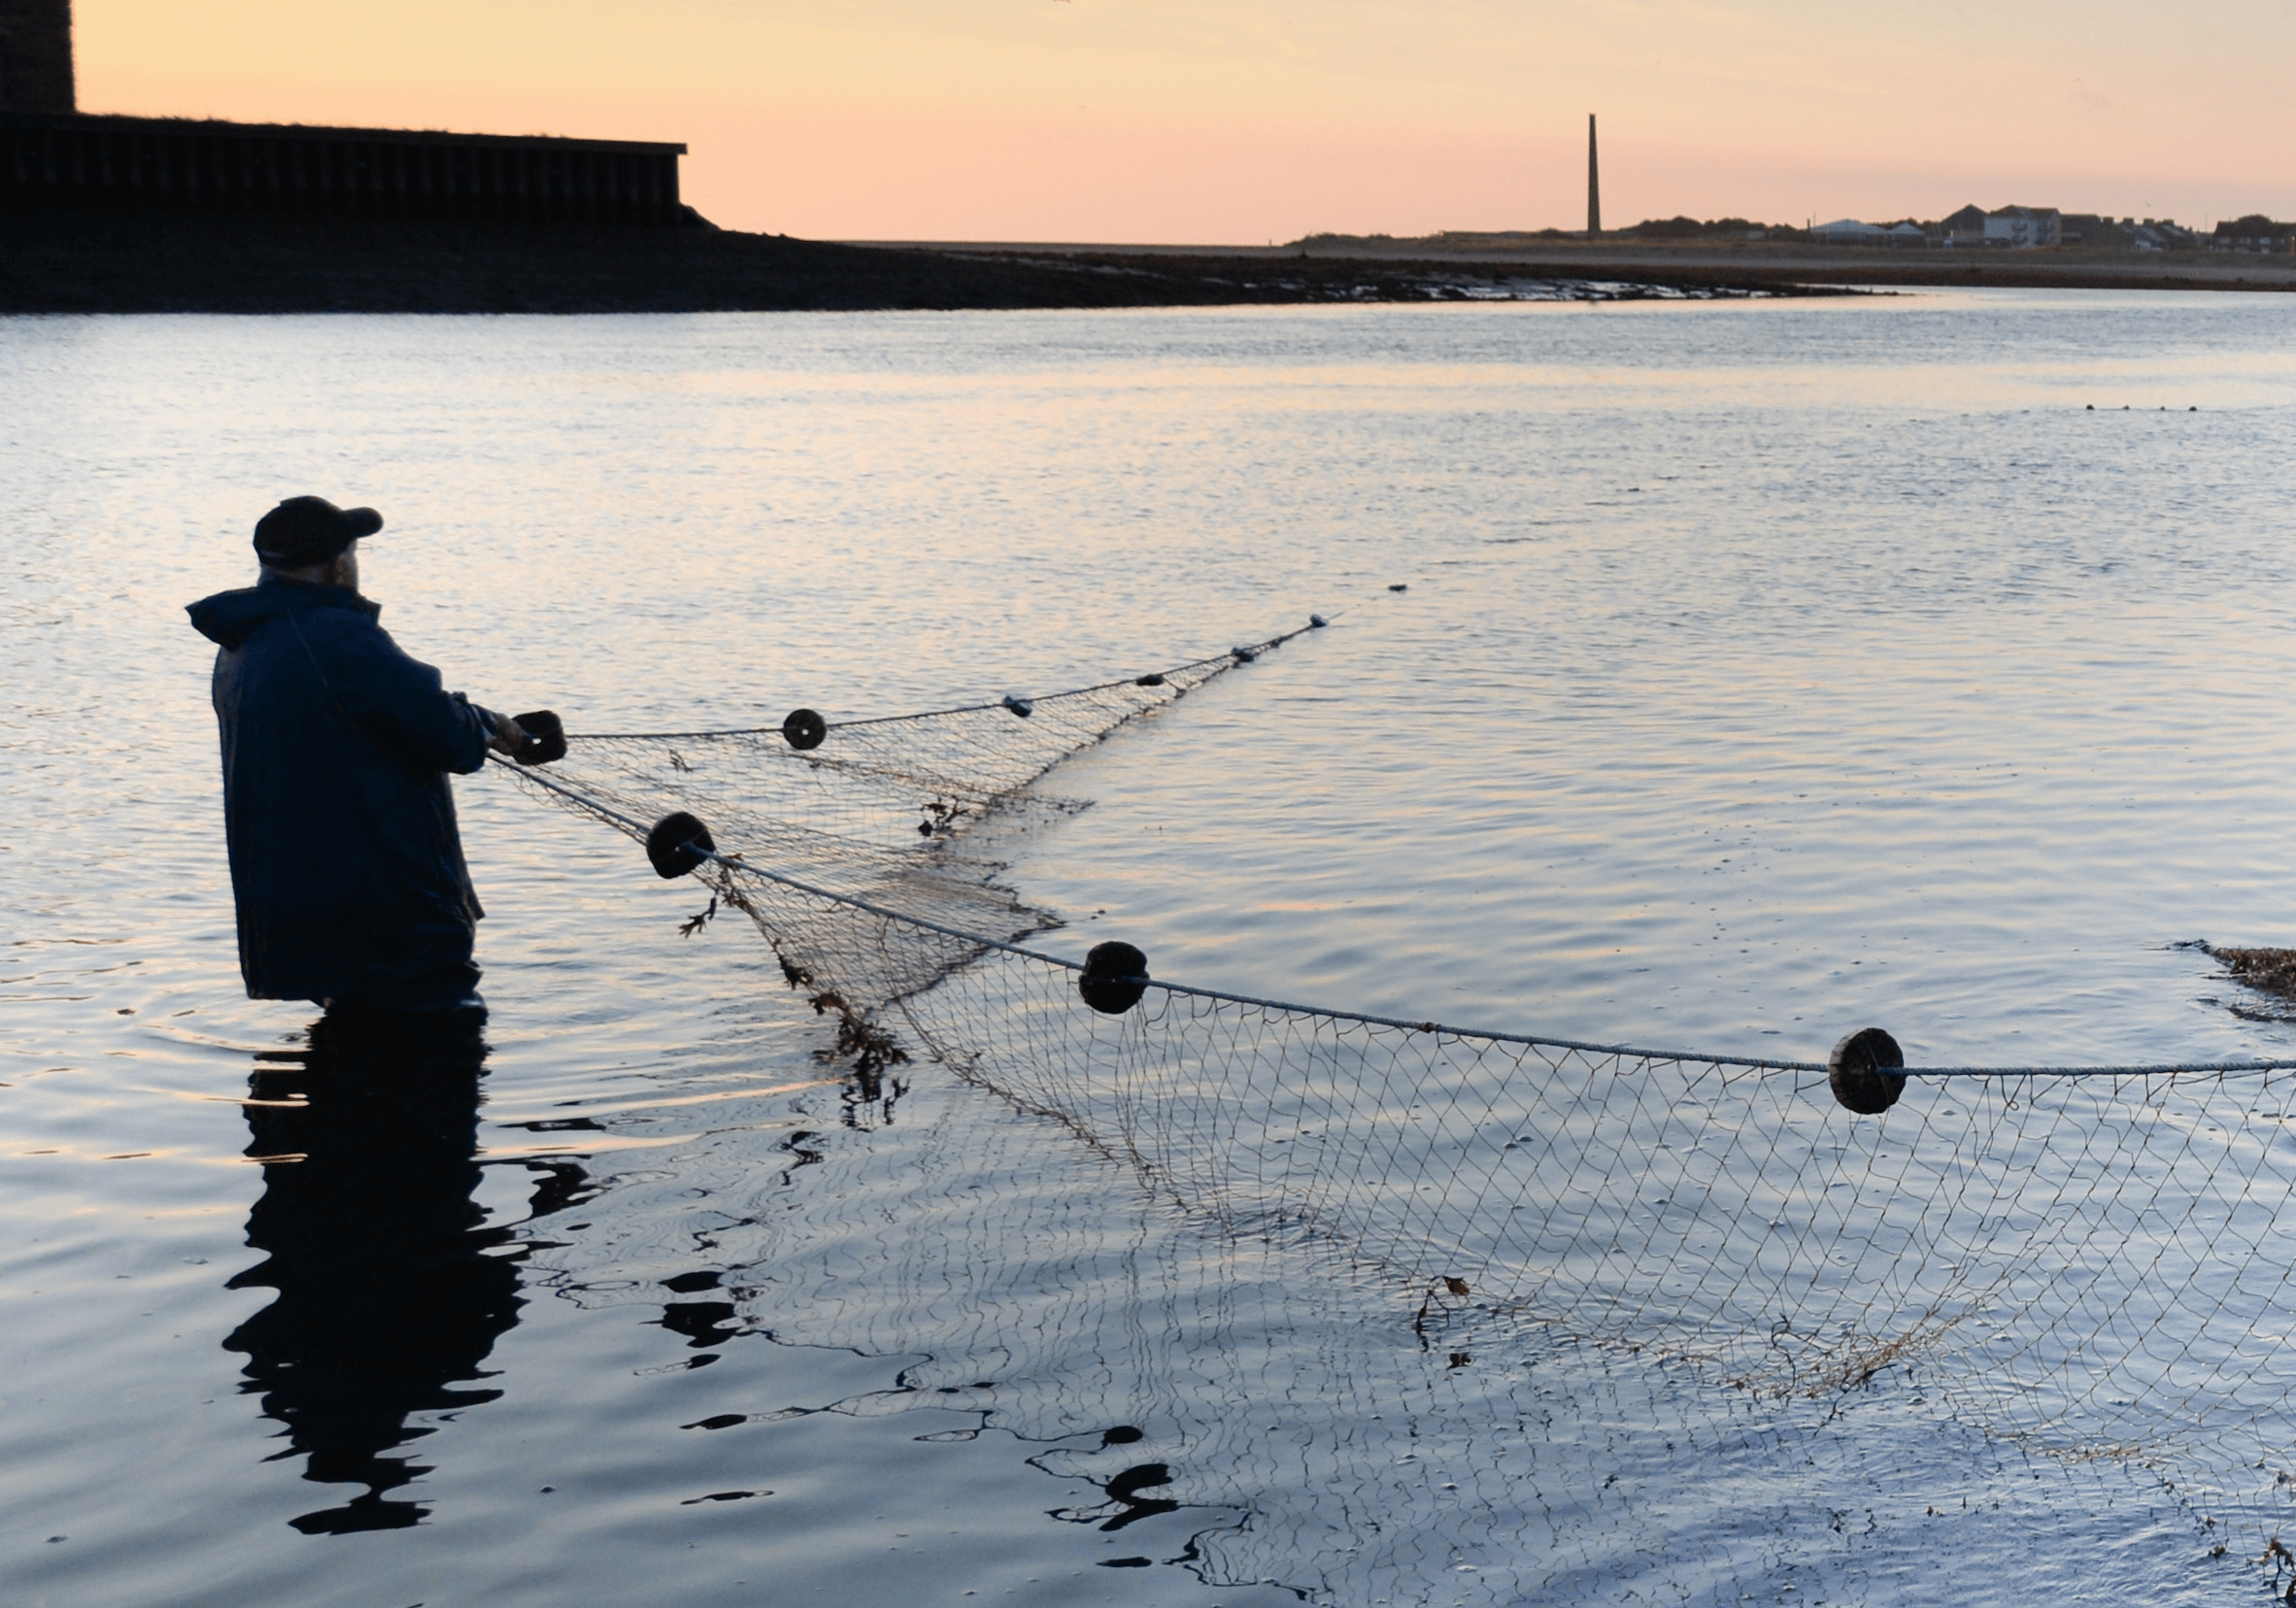 River tweed wild salmon co fishing experience days for Salmon fishing colorado